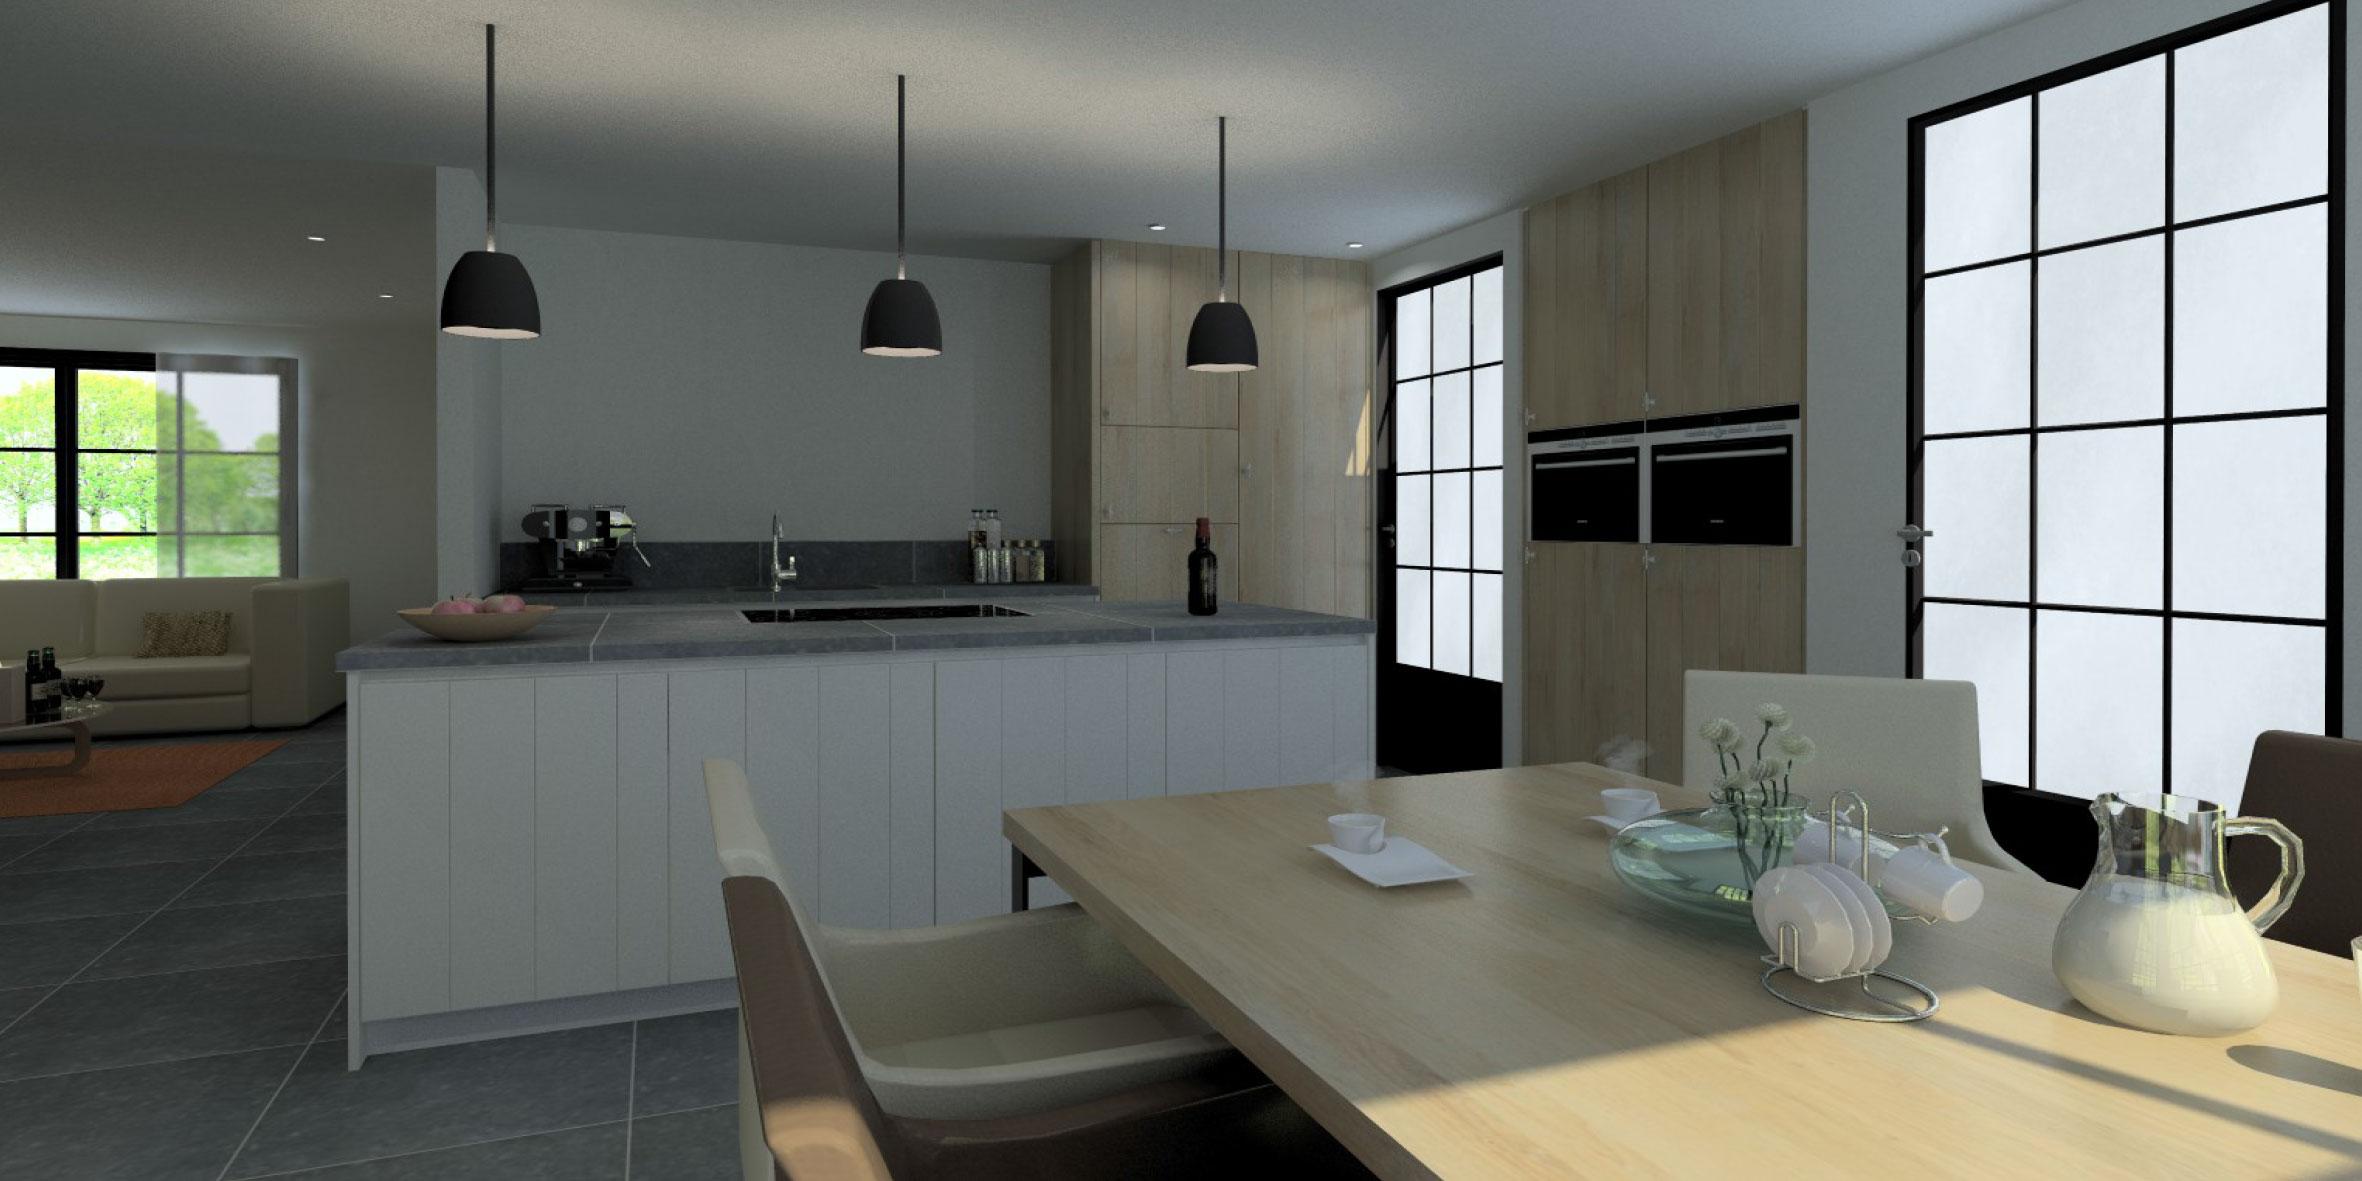 3d ontwerpen page 2 flex design for Keuken 3d ontwerpen